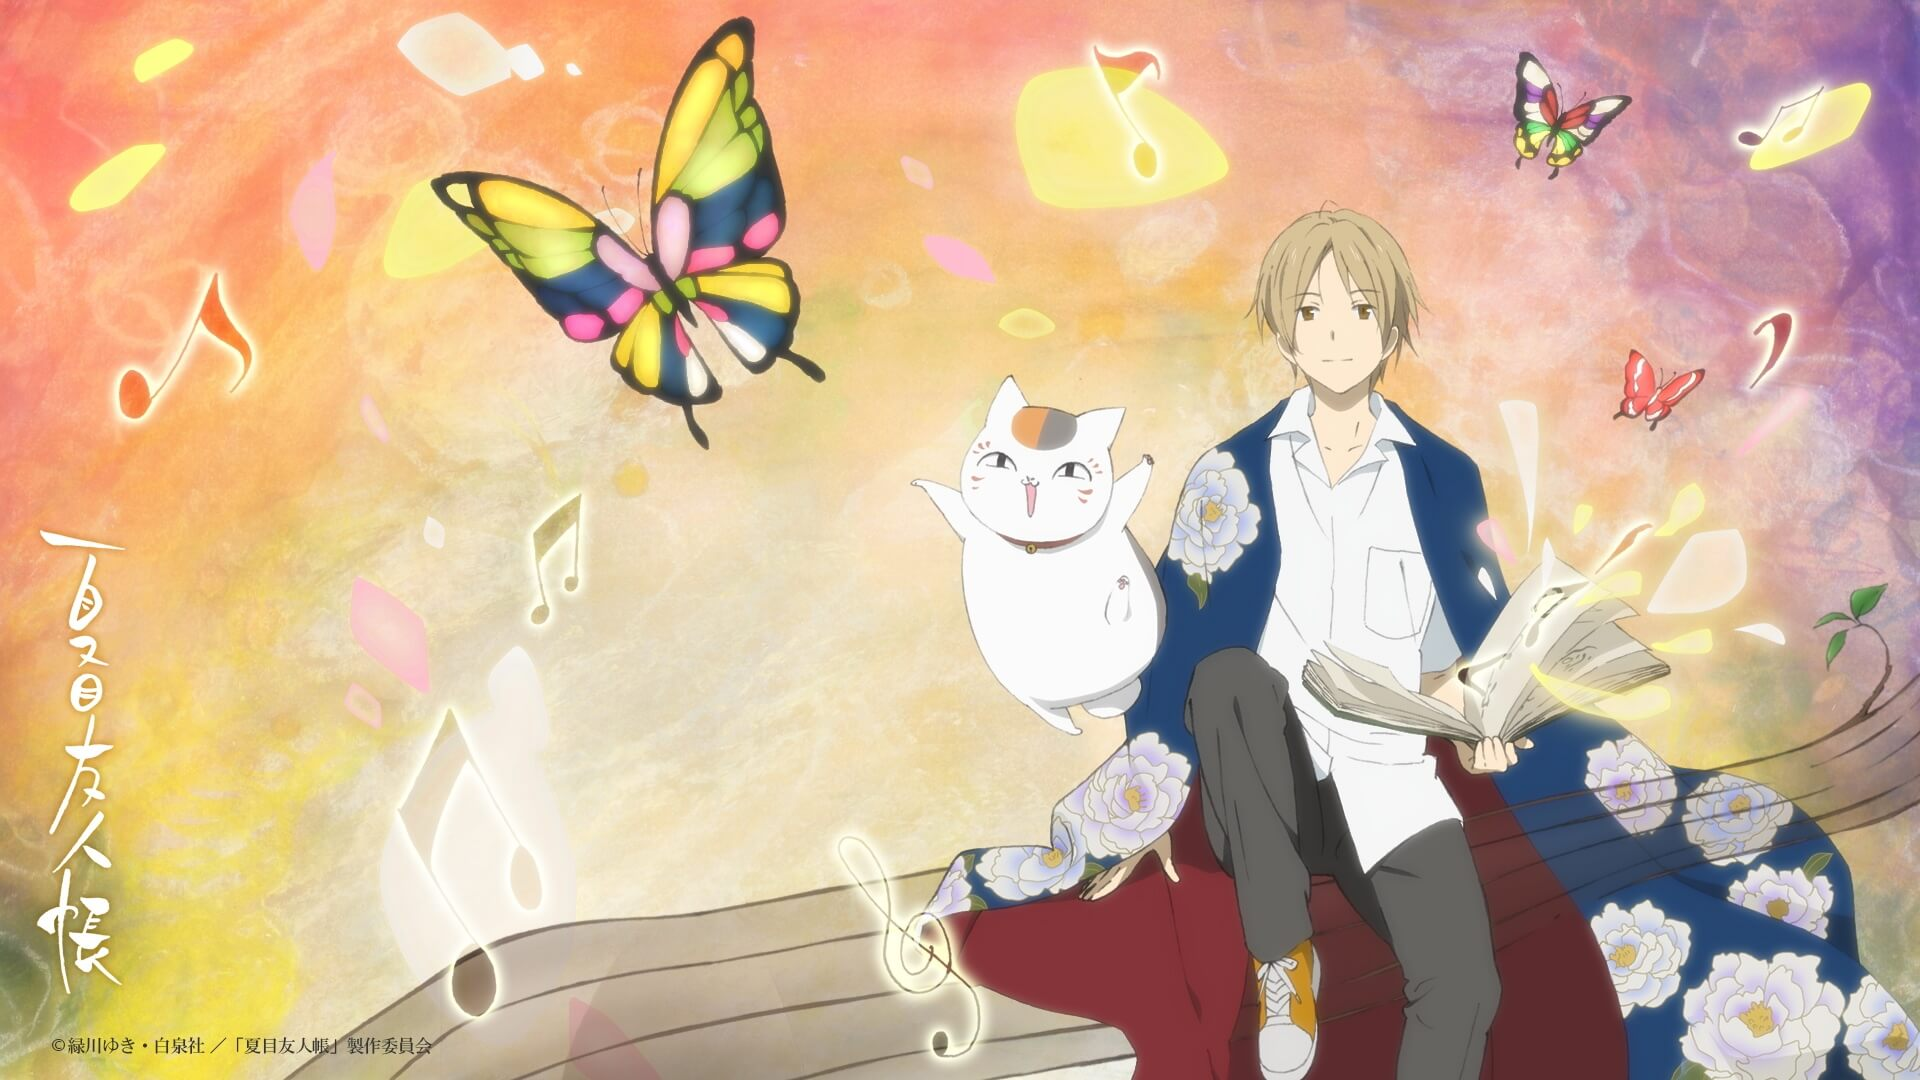 Criadora de Natsume Yuujinchou publica Novo One-Shot